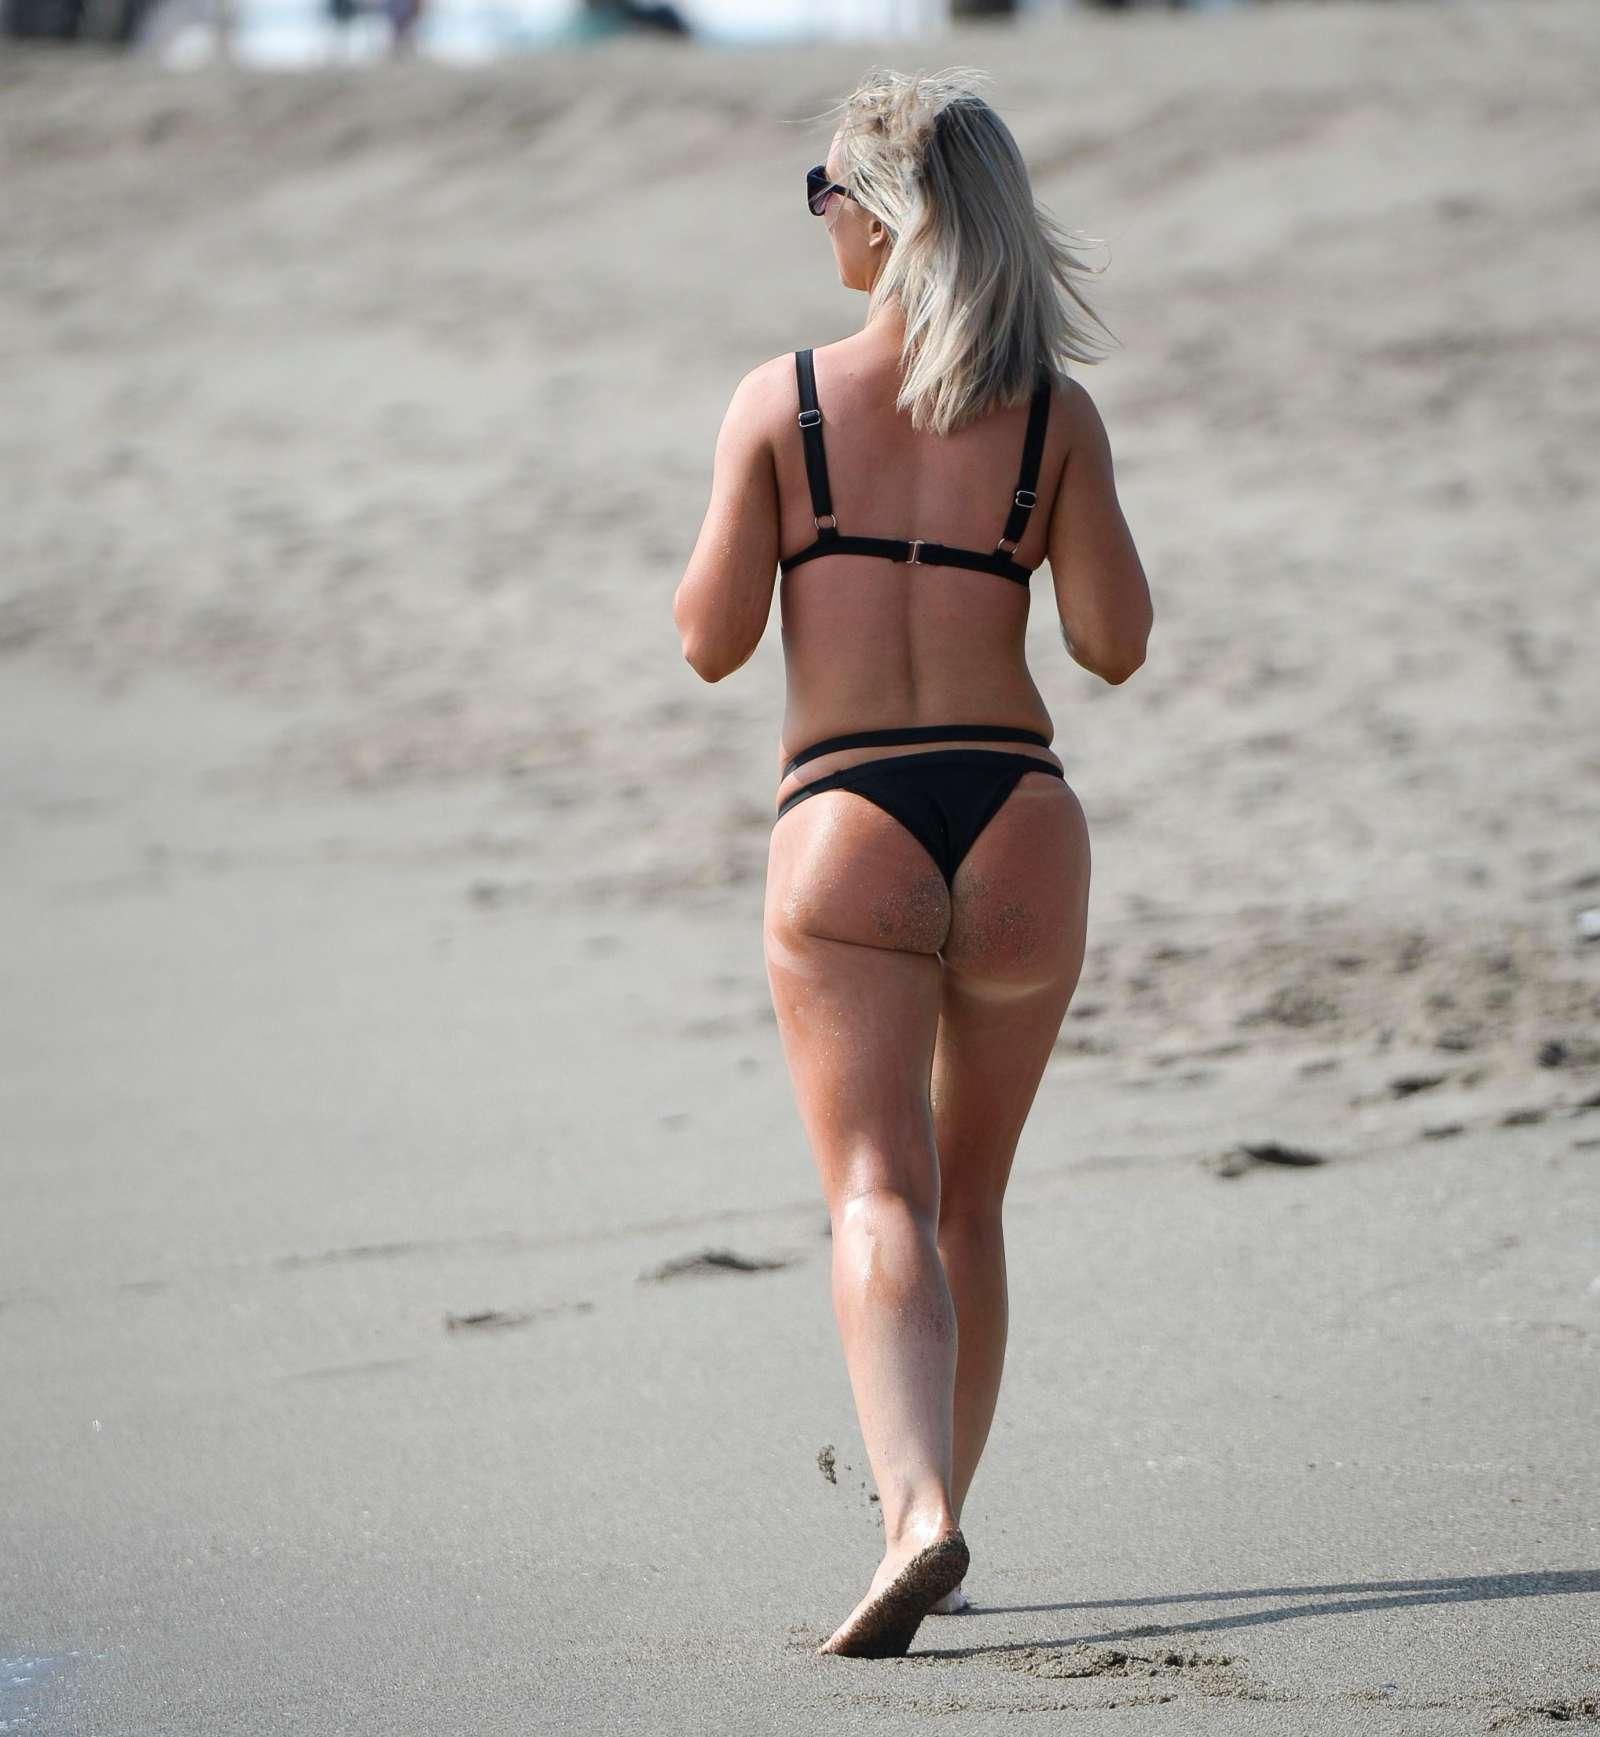 swimsuit Cleavage Michella McCollum naked photo 2017